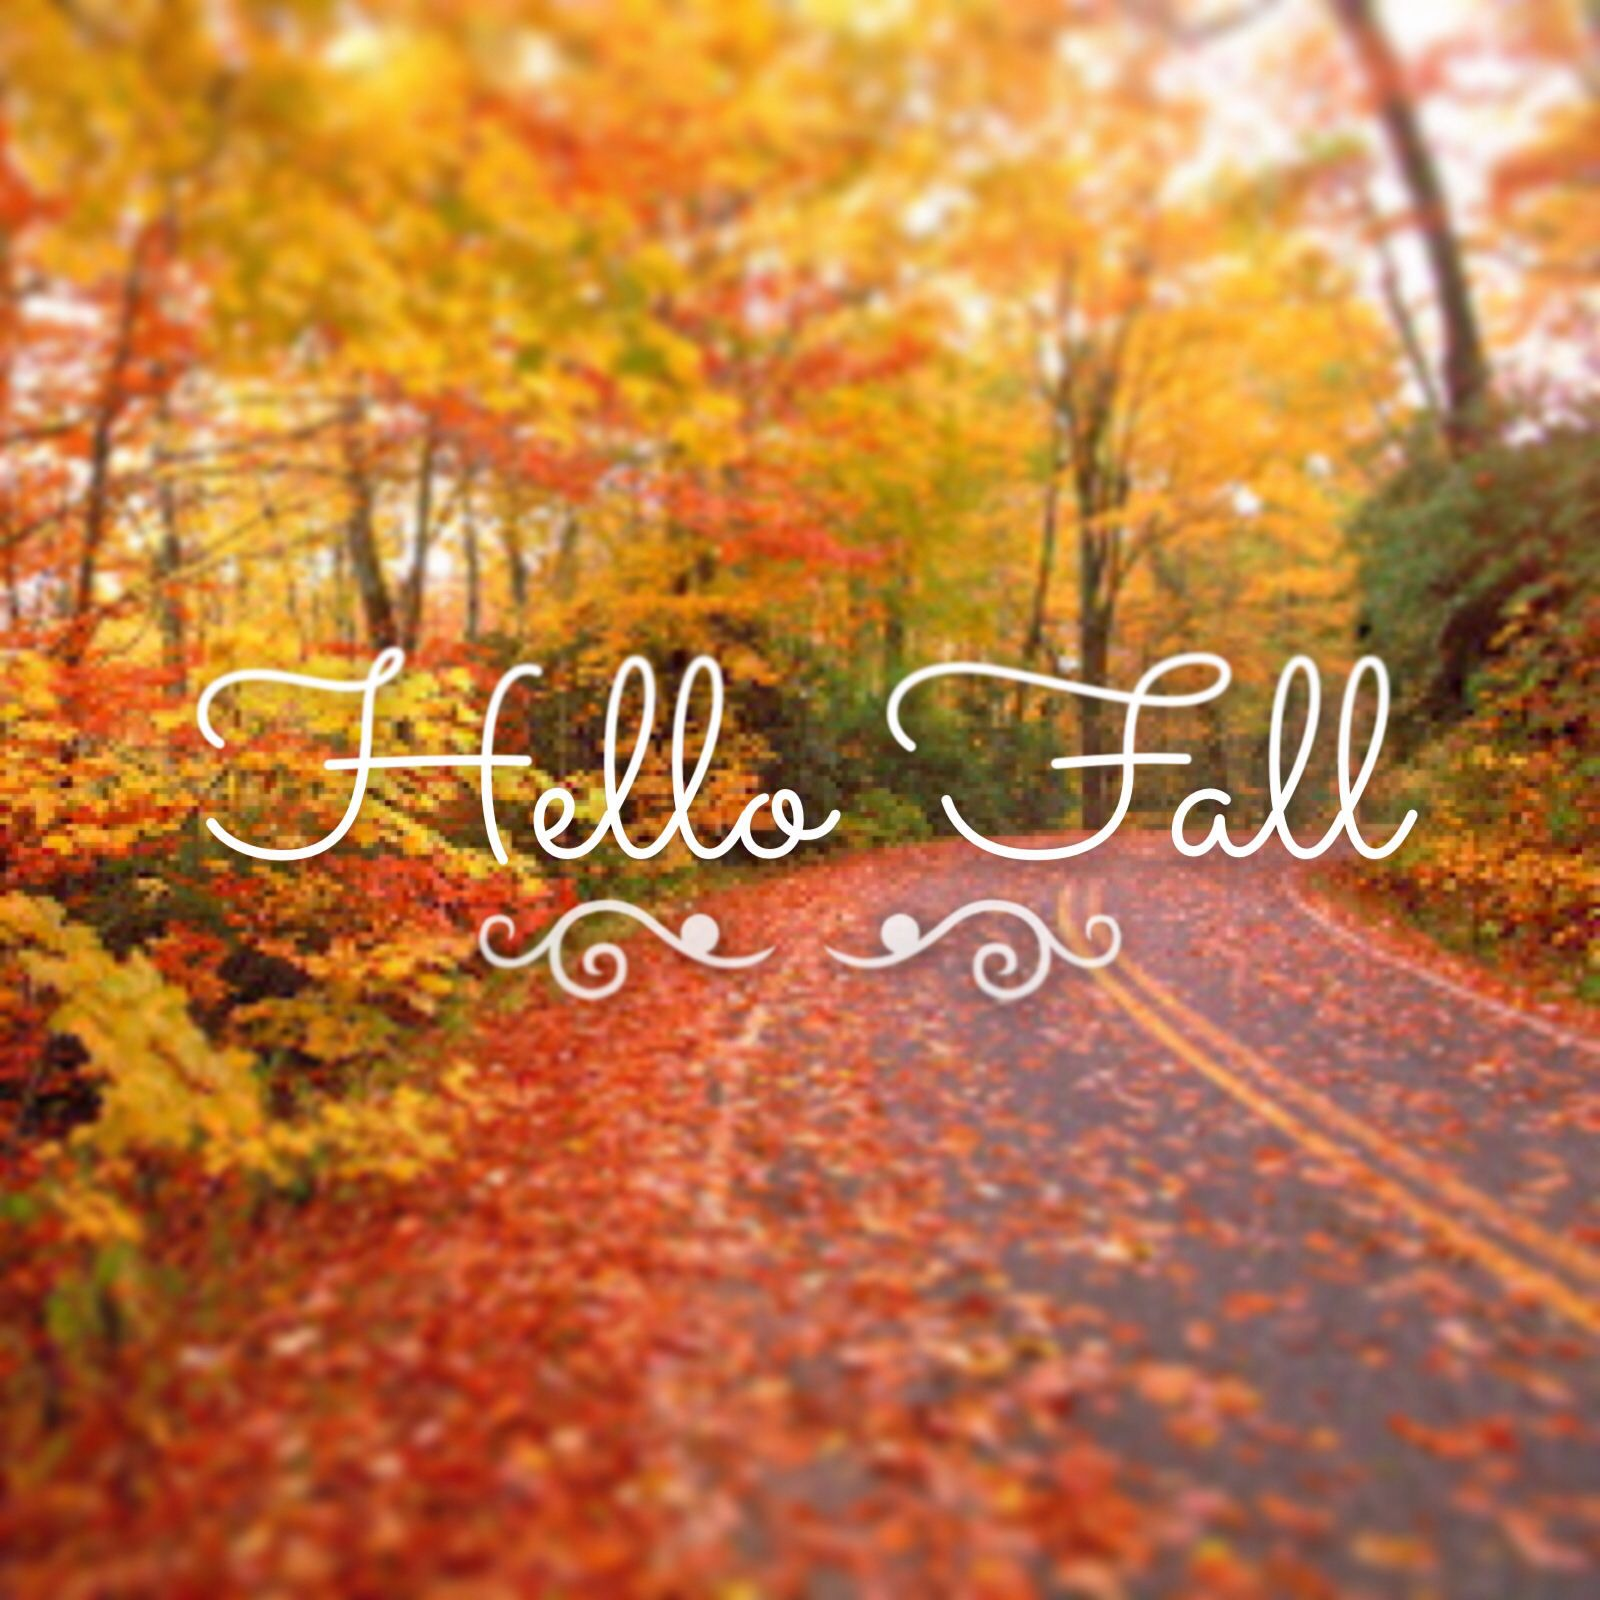 Fall Pics Wallpaper: Hello Fall :) #fall #autumn